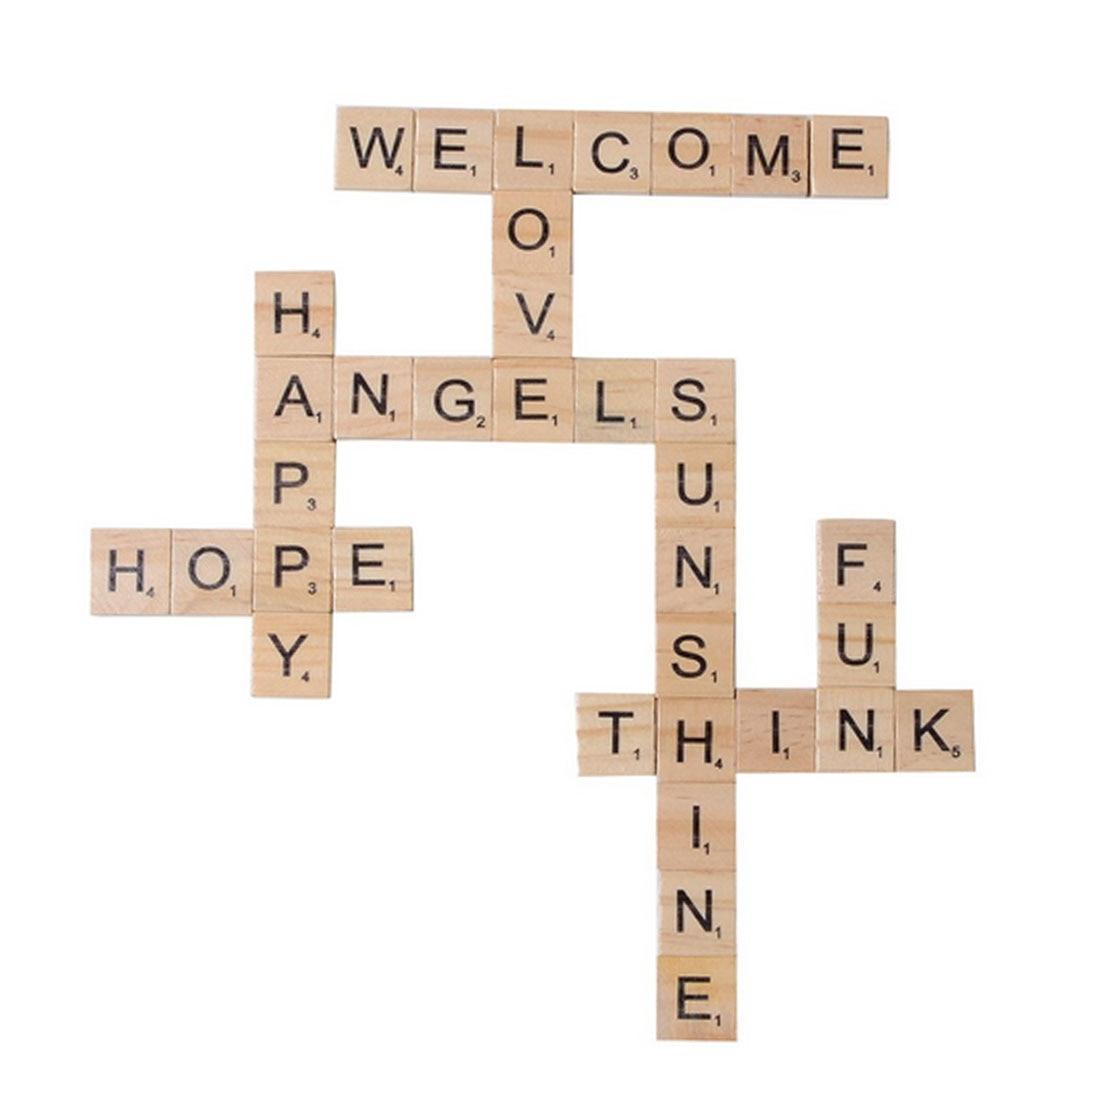 100Pcs/set Wooden Alphabet Letter Tiles Black Scrabble Letters For Crafts Wood Letter Alphabet Scrabbles Number English Words